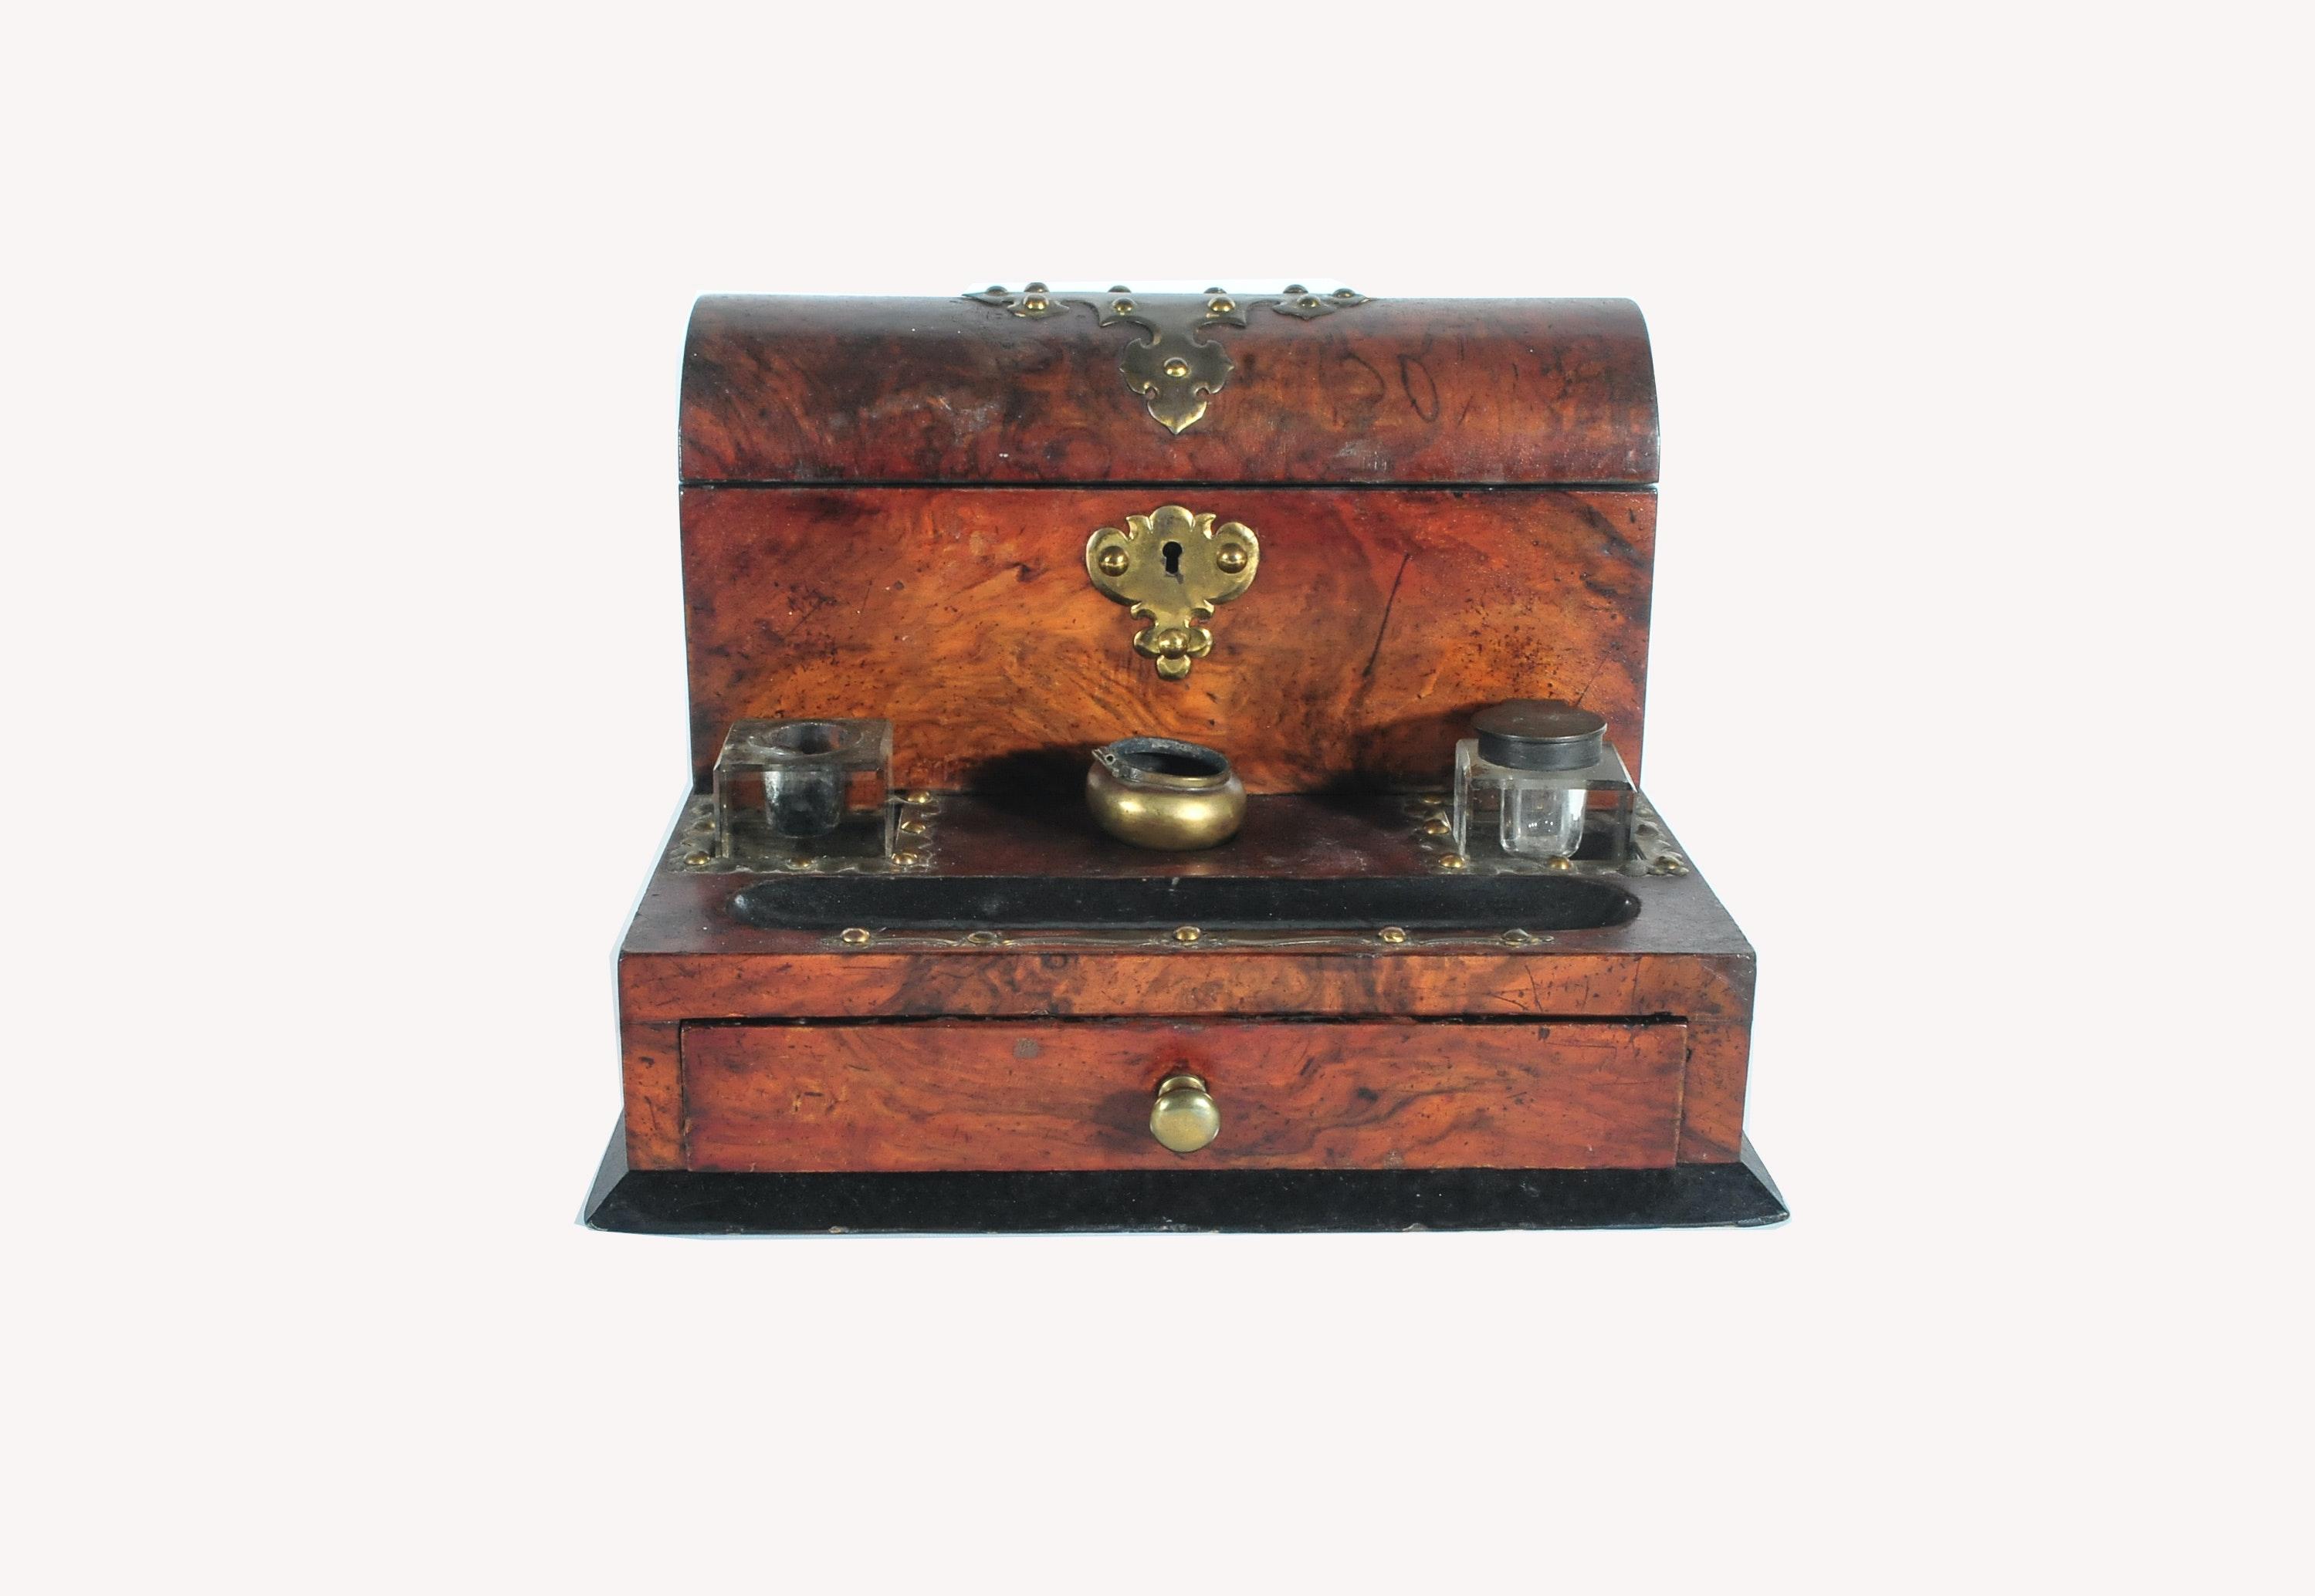 Antique English Burlwood Veneer Desk Stand